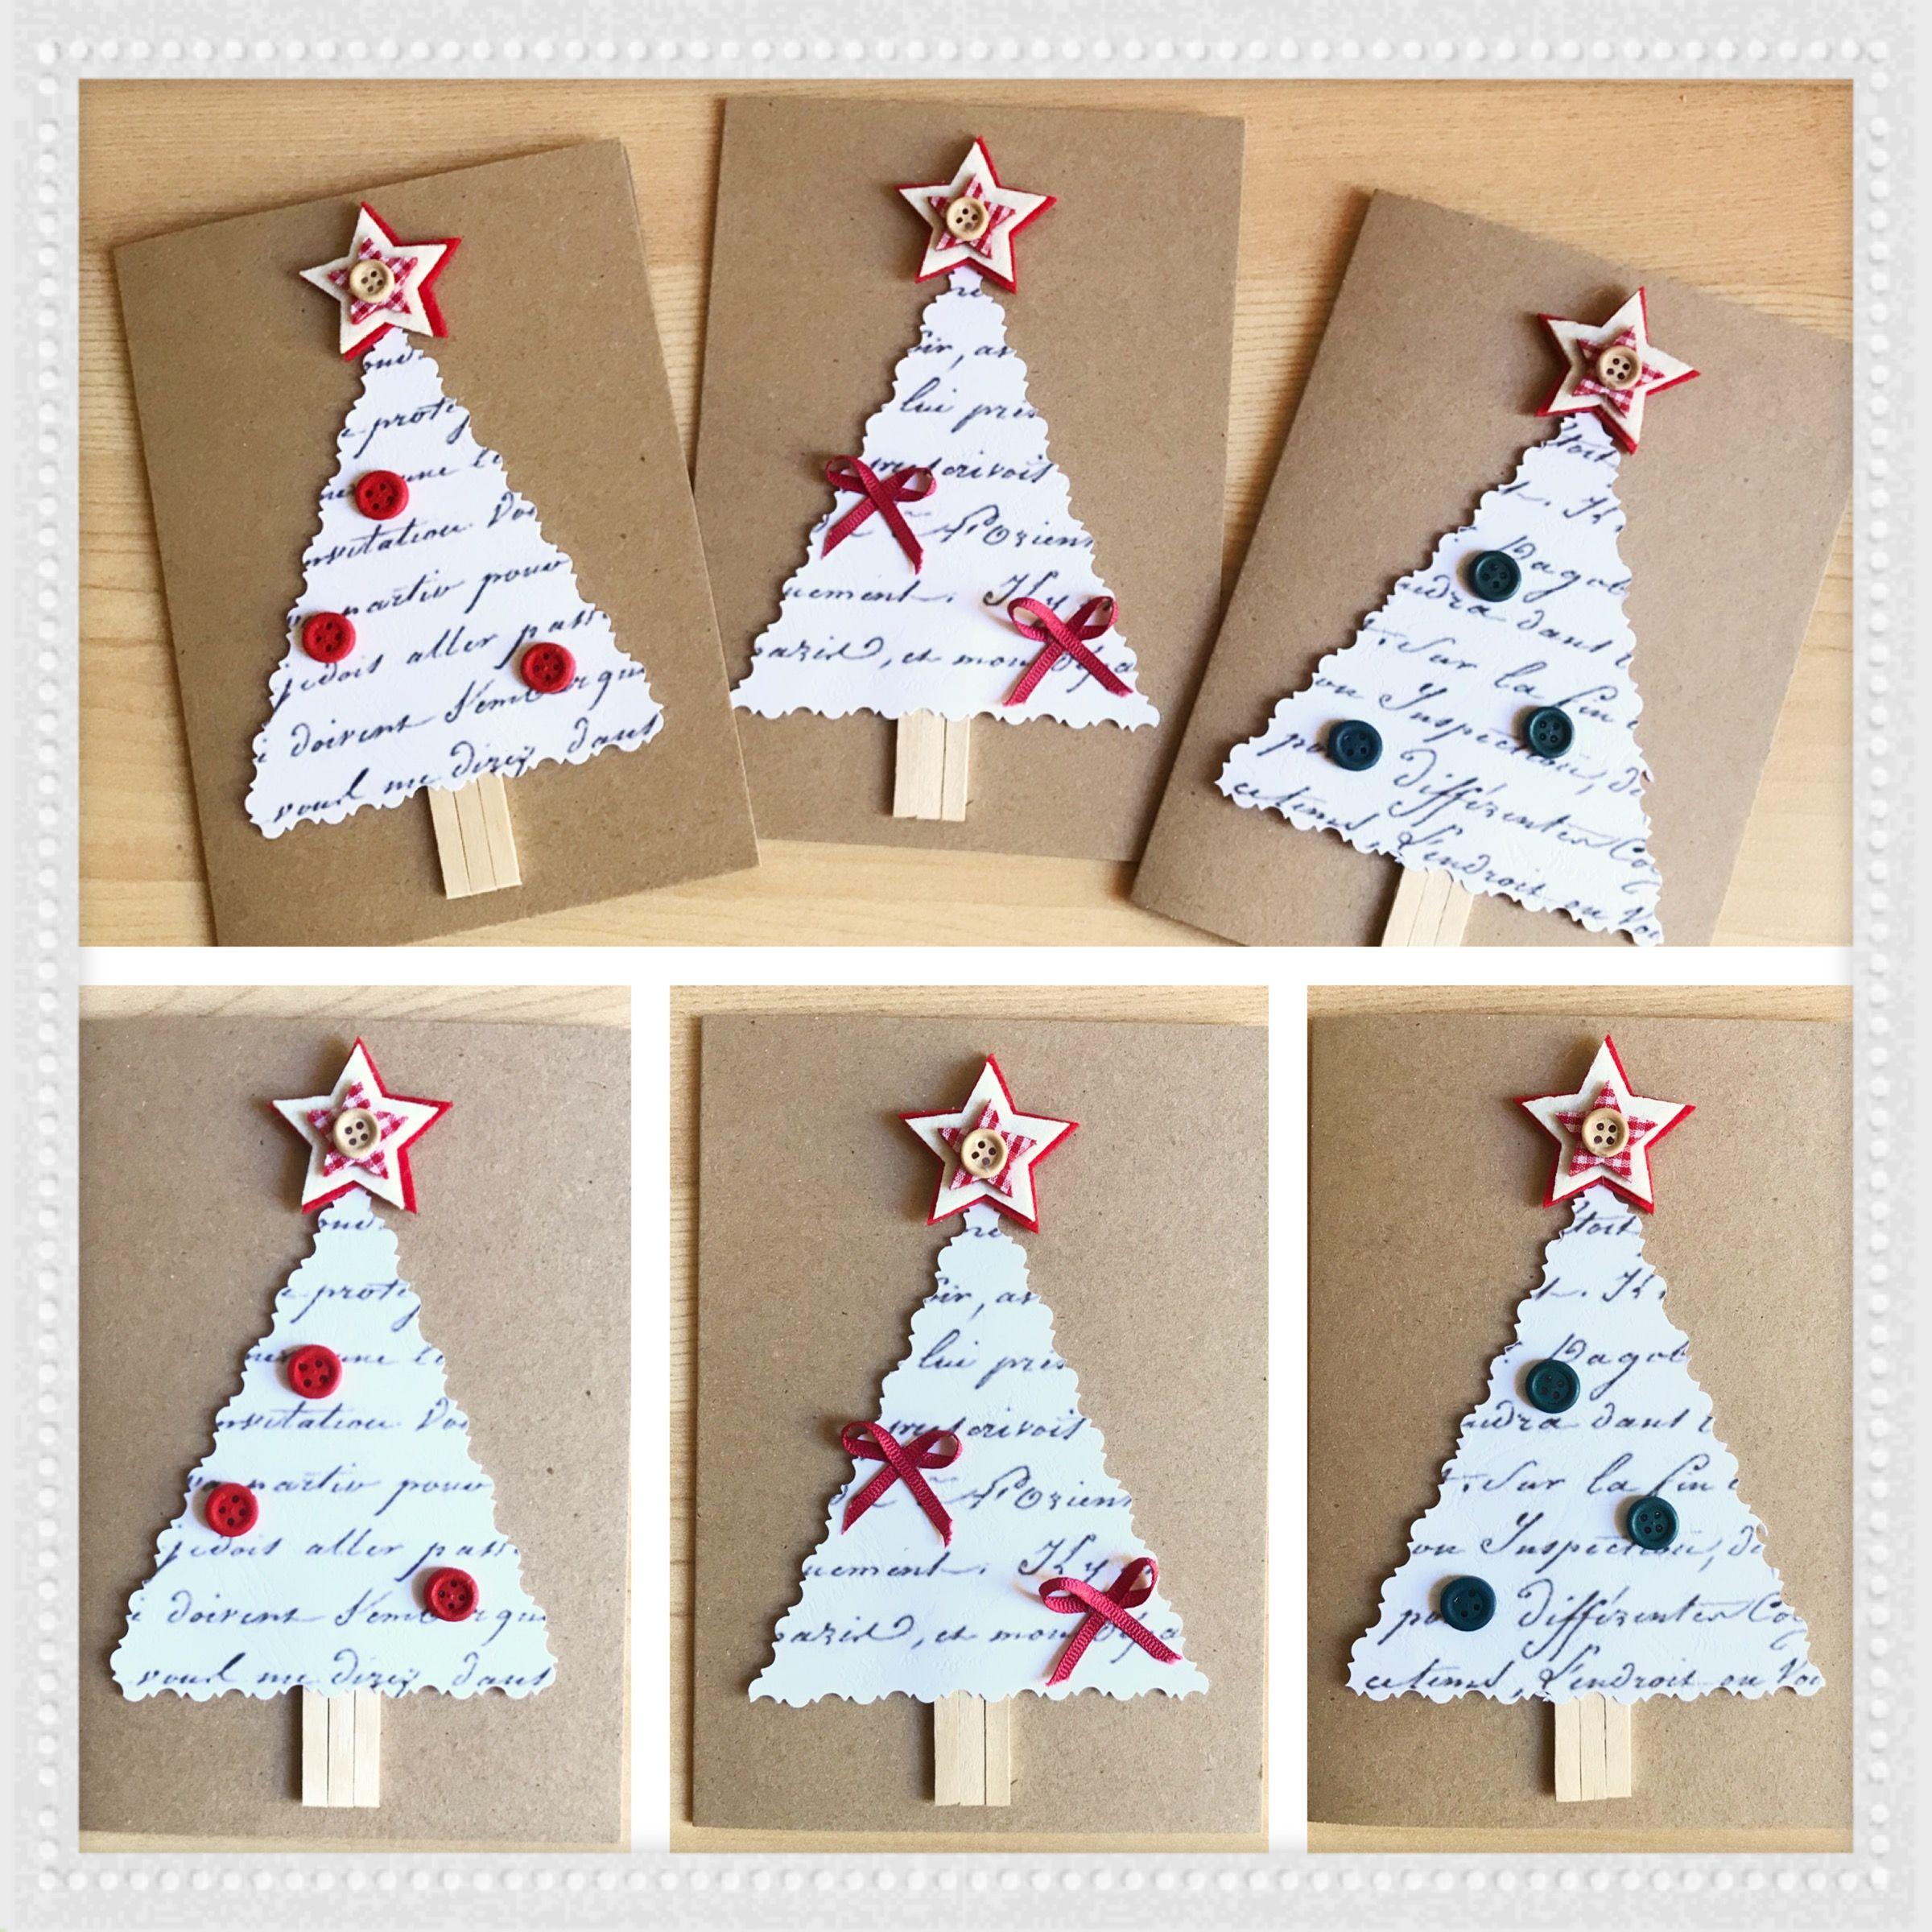 Stella Handicrafts Χριστουγεννιάτικες κάρτες 2018 Christmas Cards